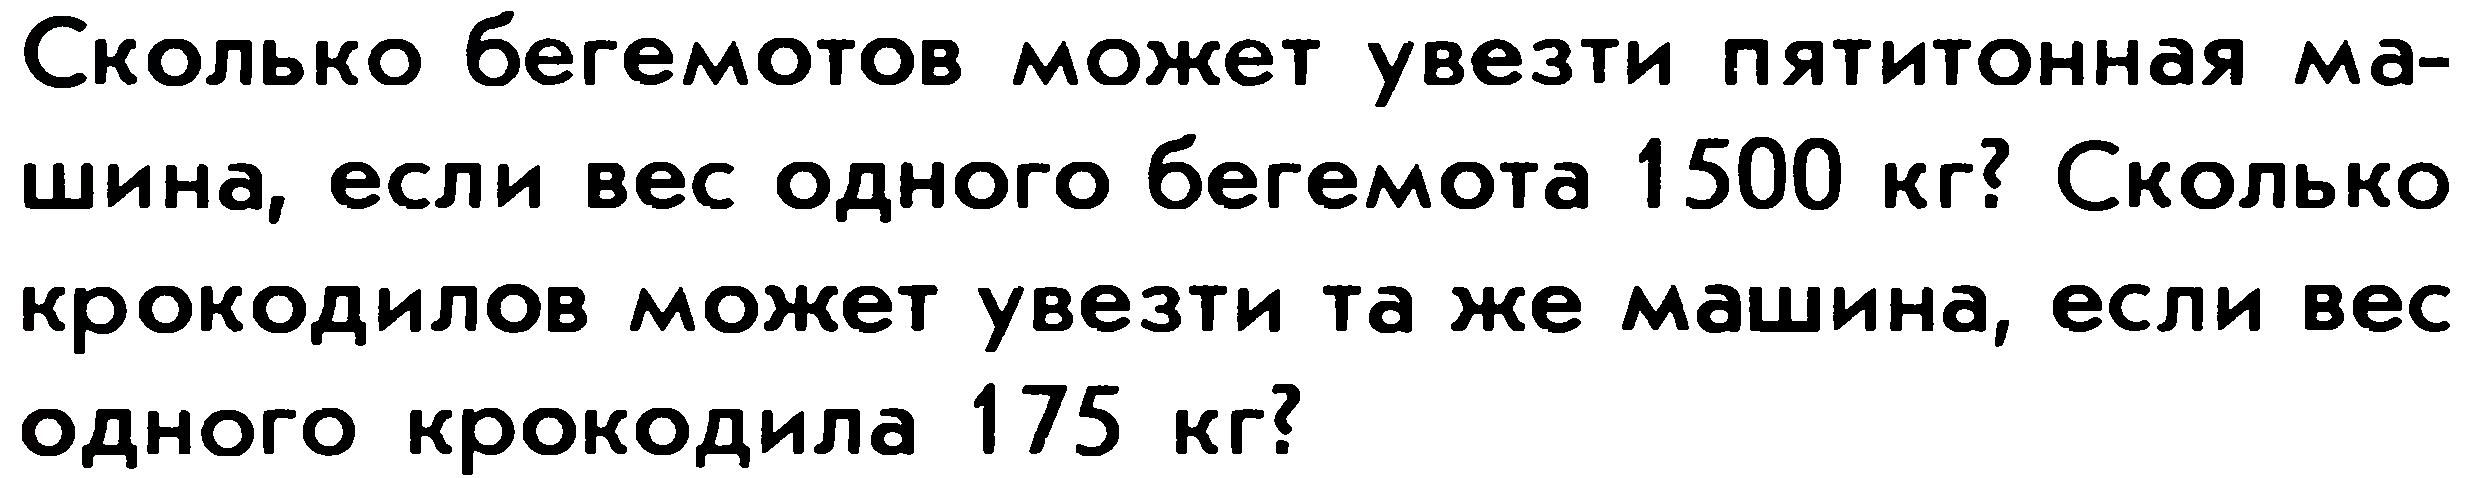 hello_html_m66f4e6ab.png